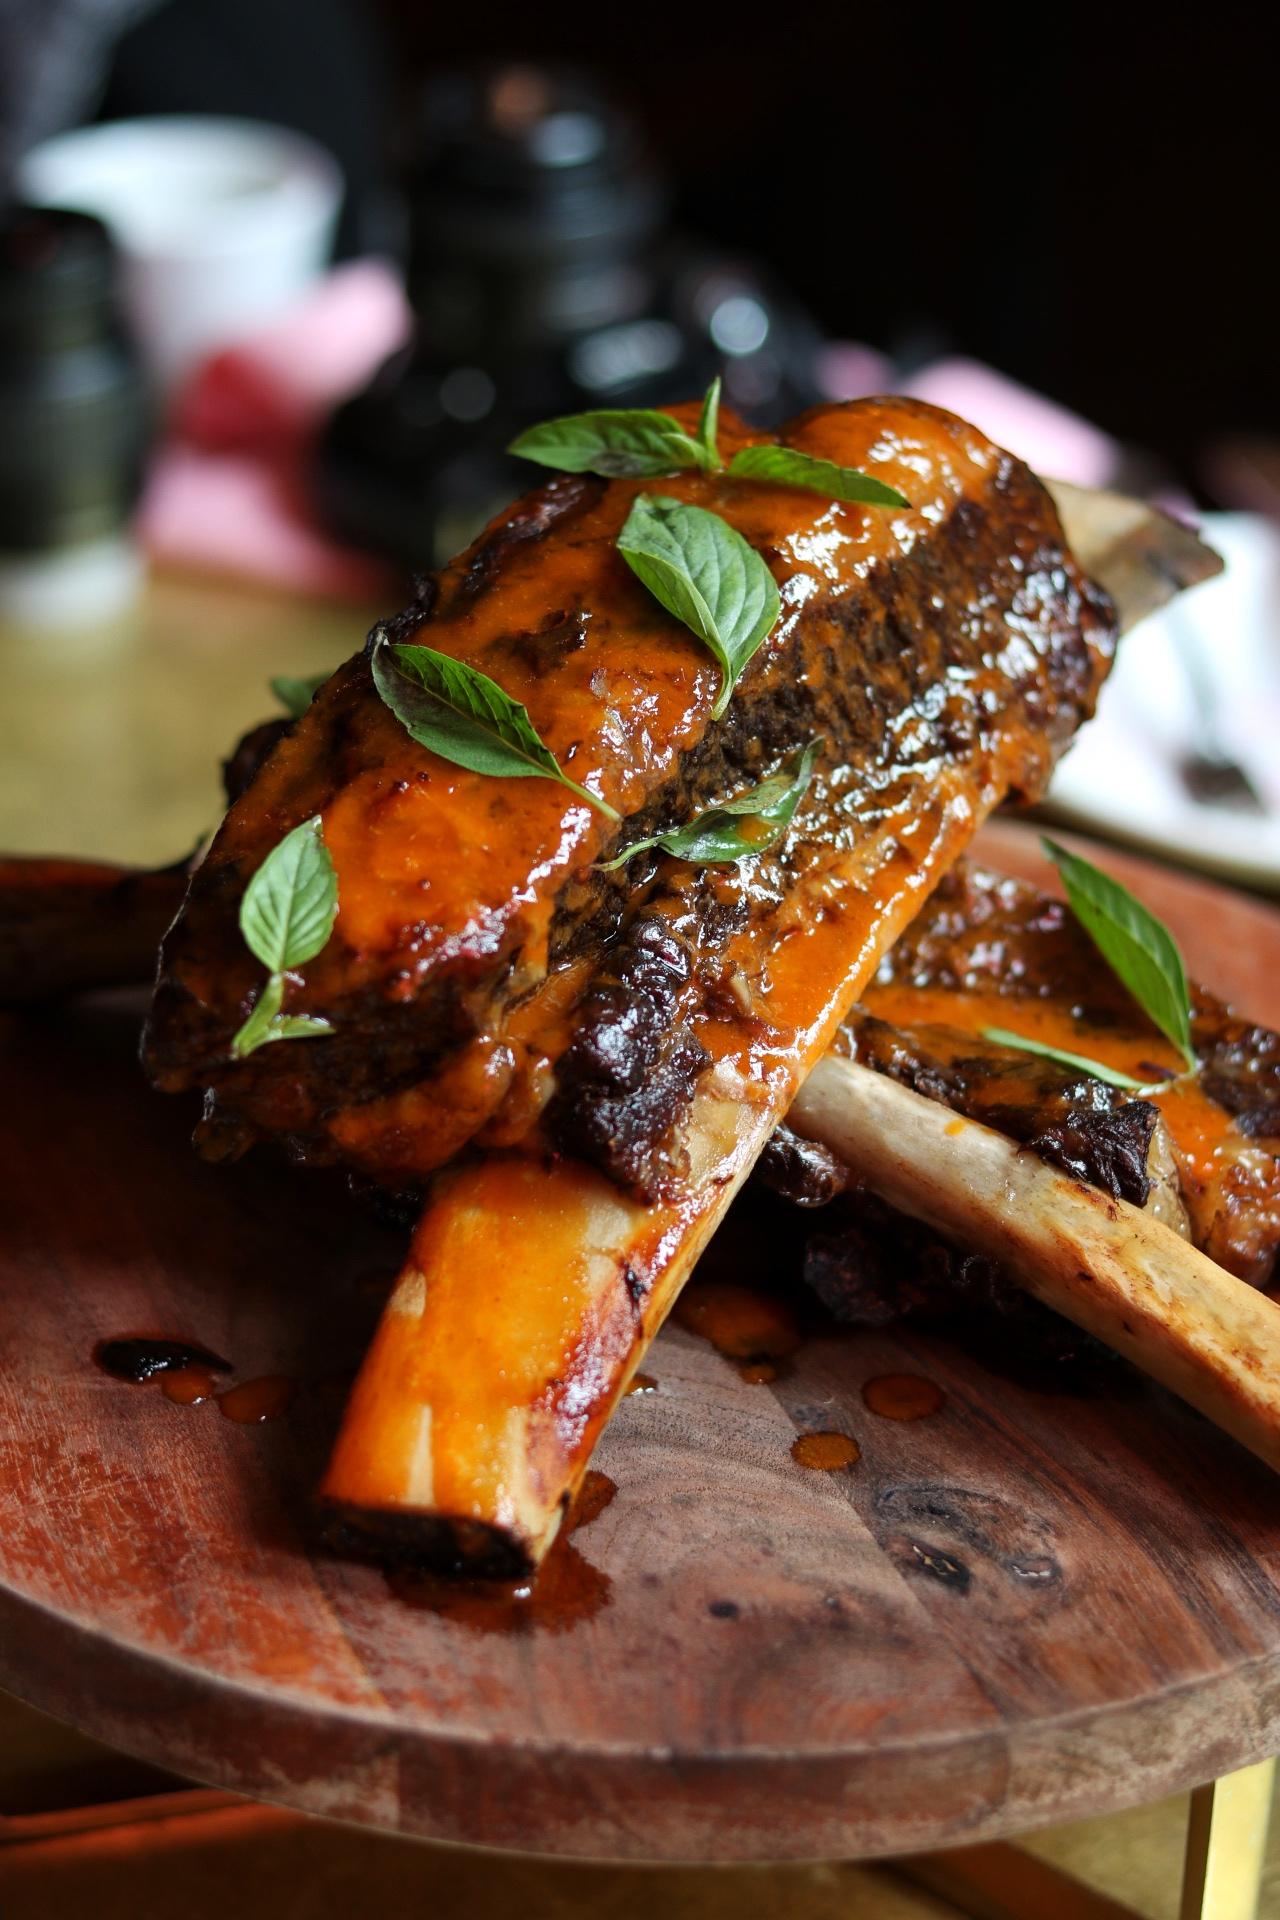 Beef ribs henry at life